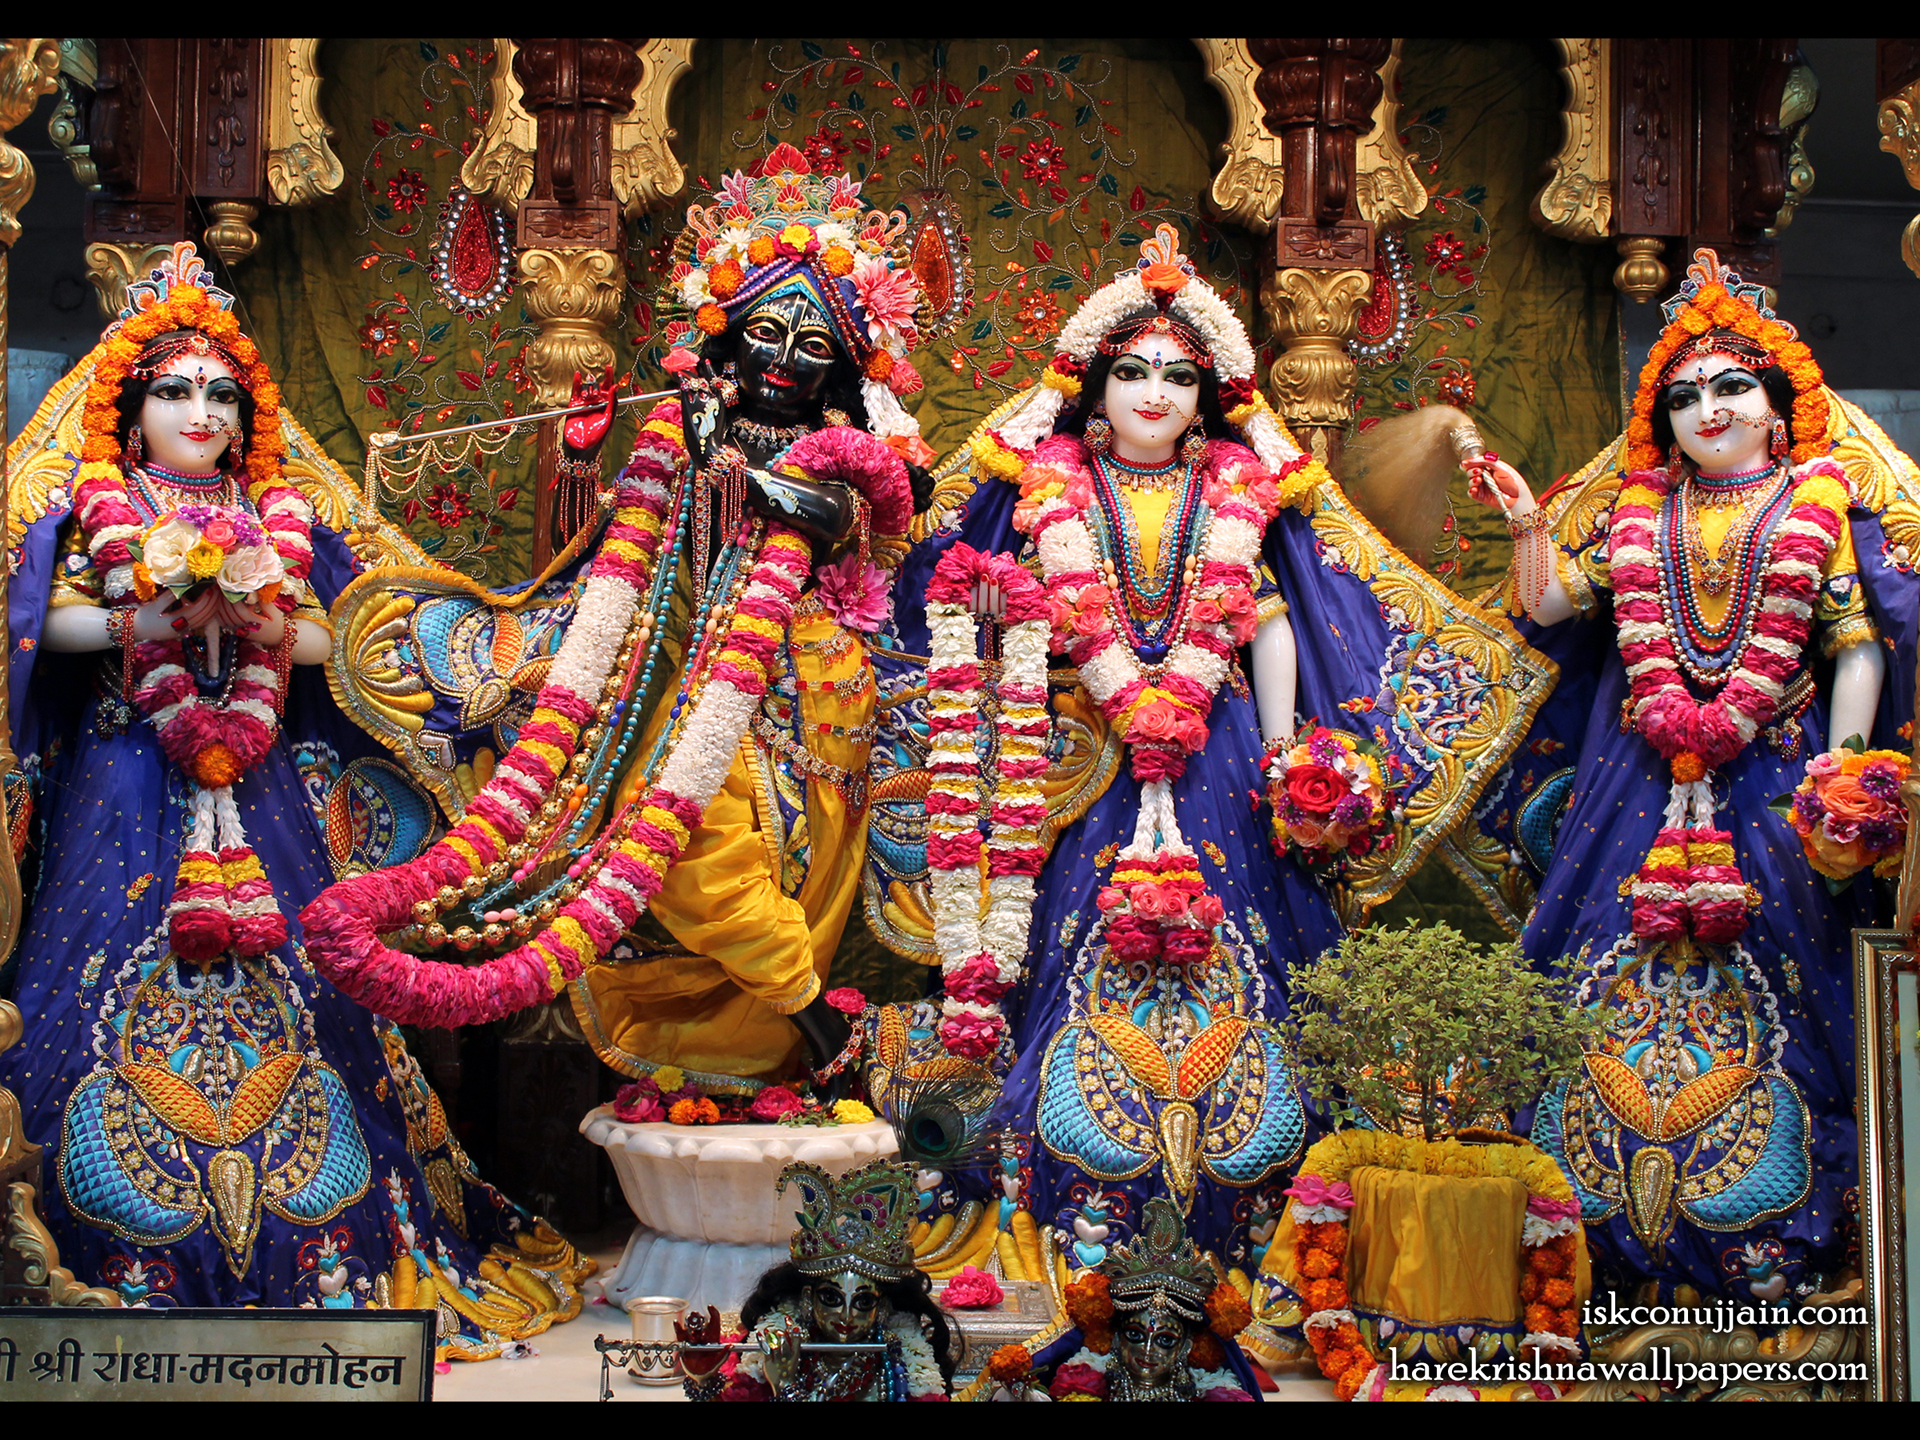 Sri Sri Radha Madanmohan Lalita Vishakha Wallpaper (002) Size 1920x1440 Download